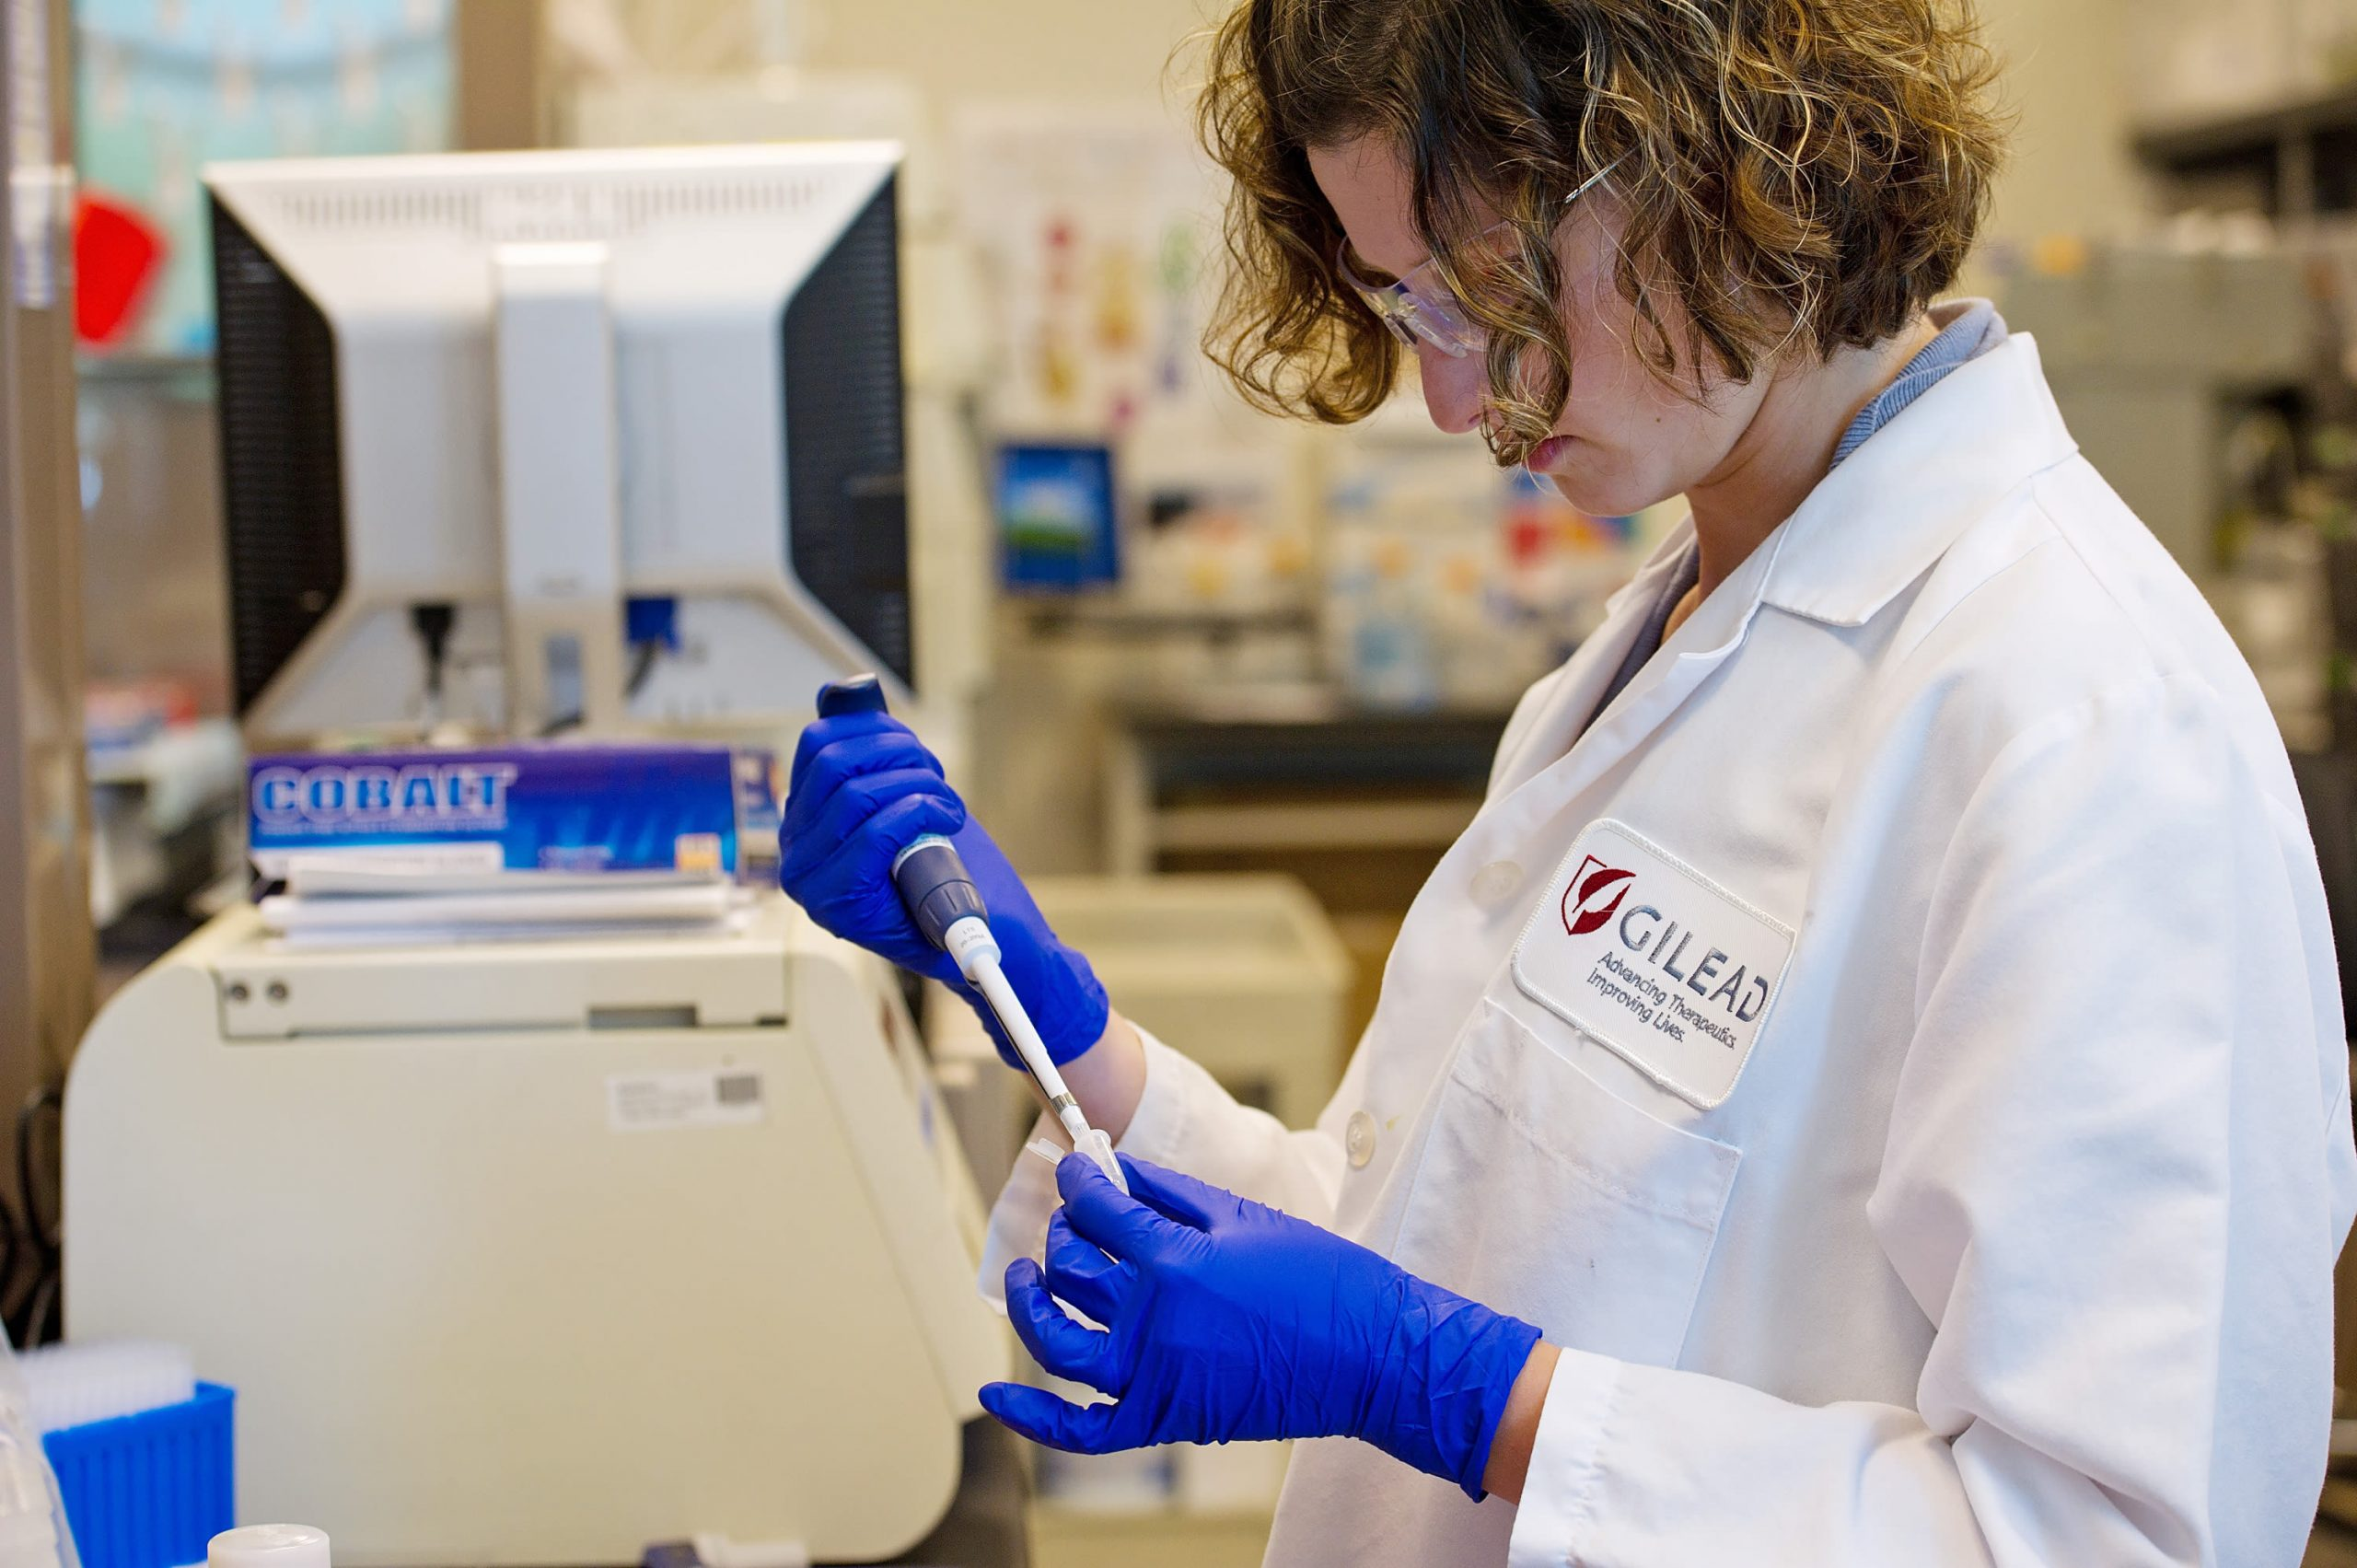 Gilead Sciences Ελλάς:Υπέγραψε συμφωνία με το ΙΦΕΤ για προμήθεια του remdesivir